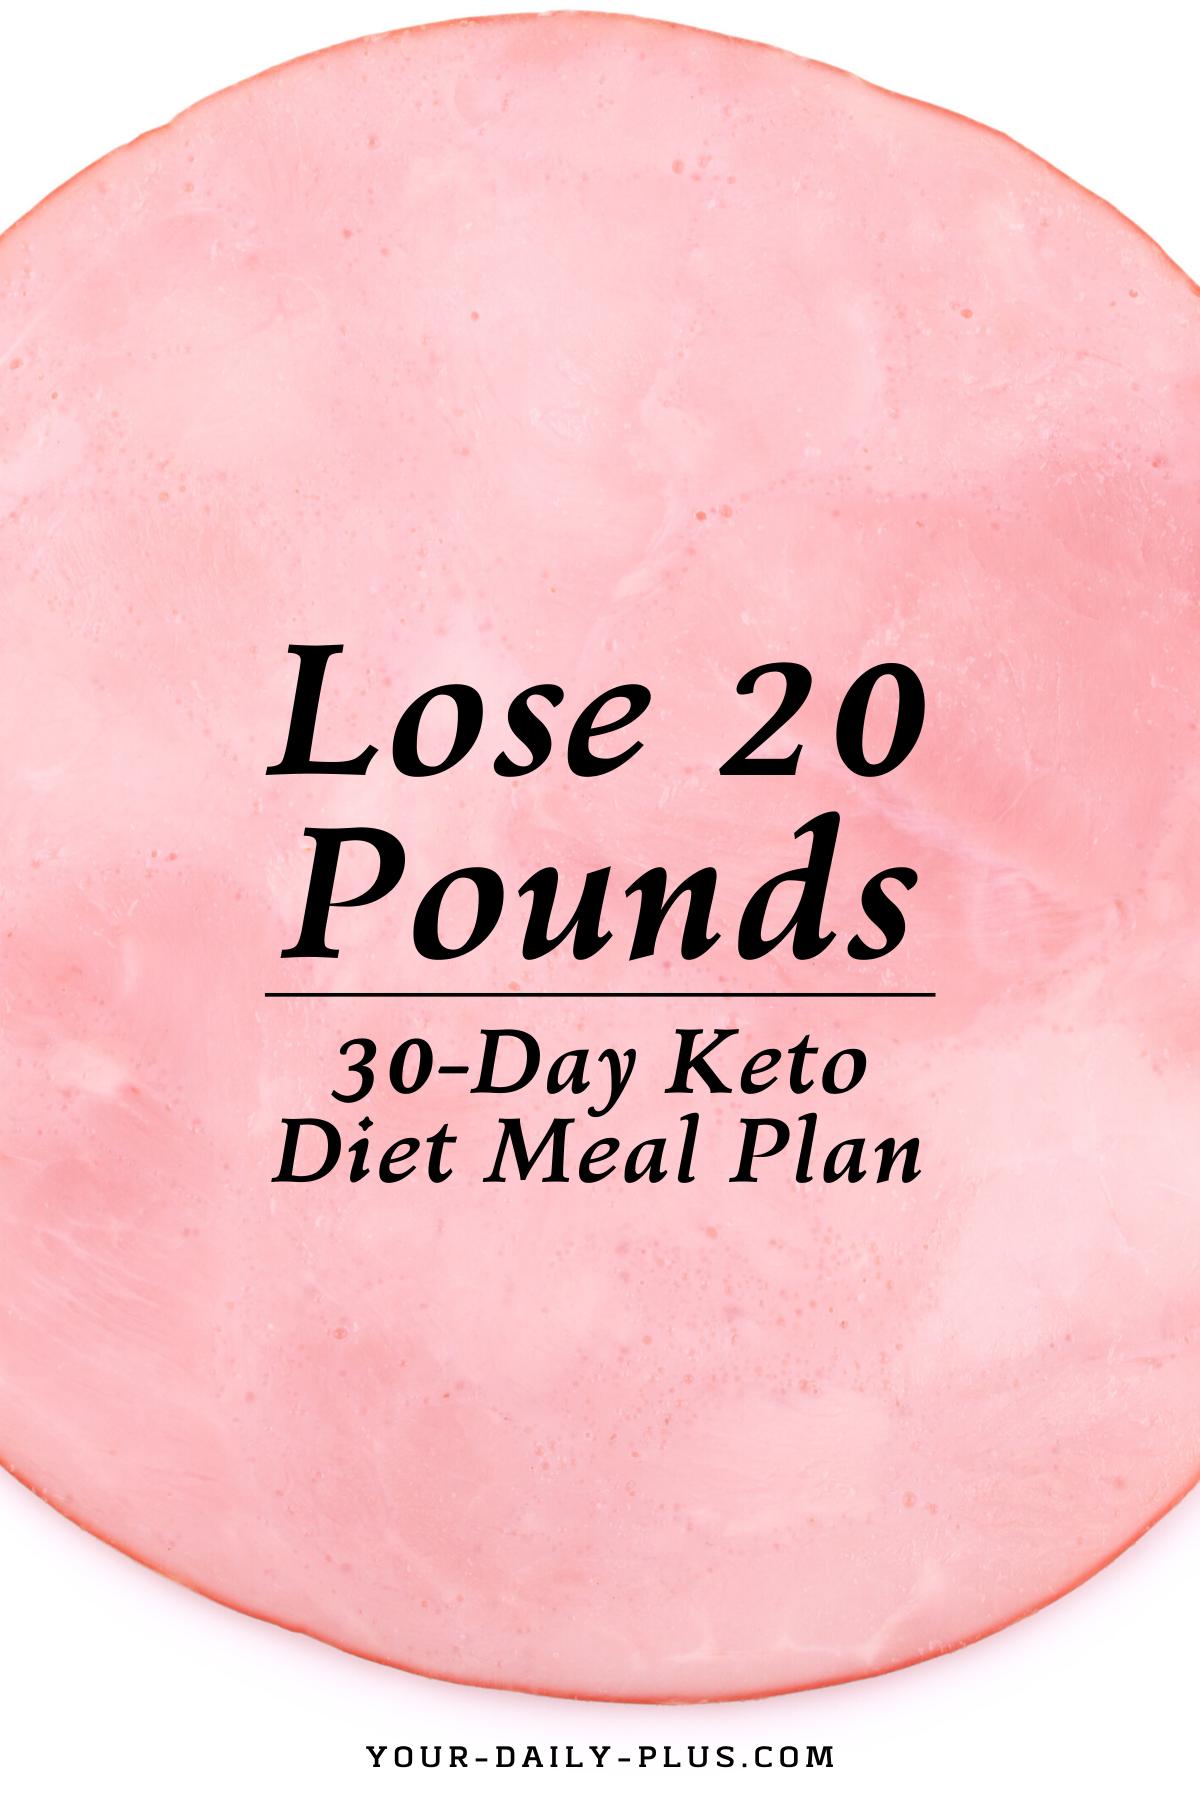 Keto Daily Meal Plan Sample